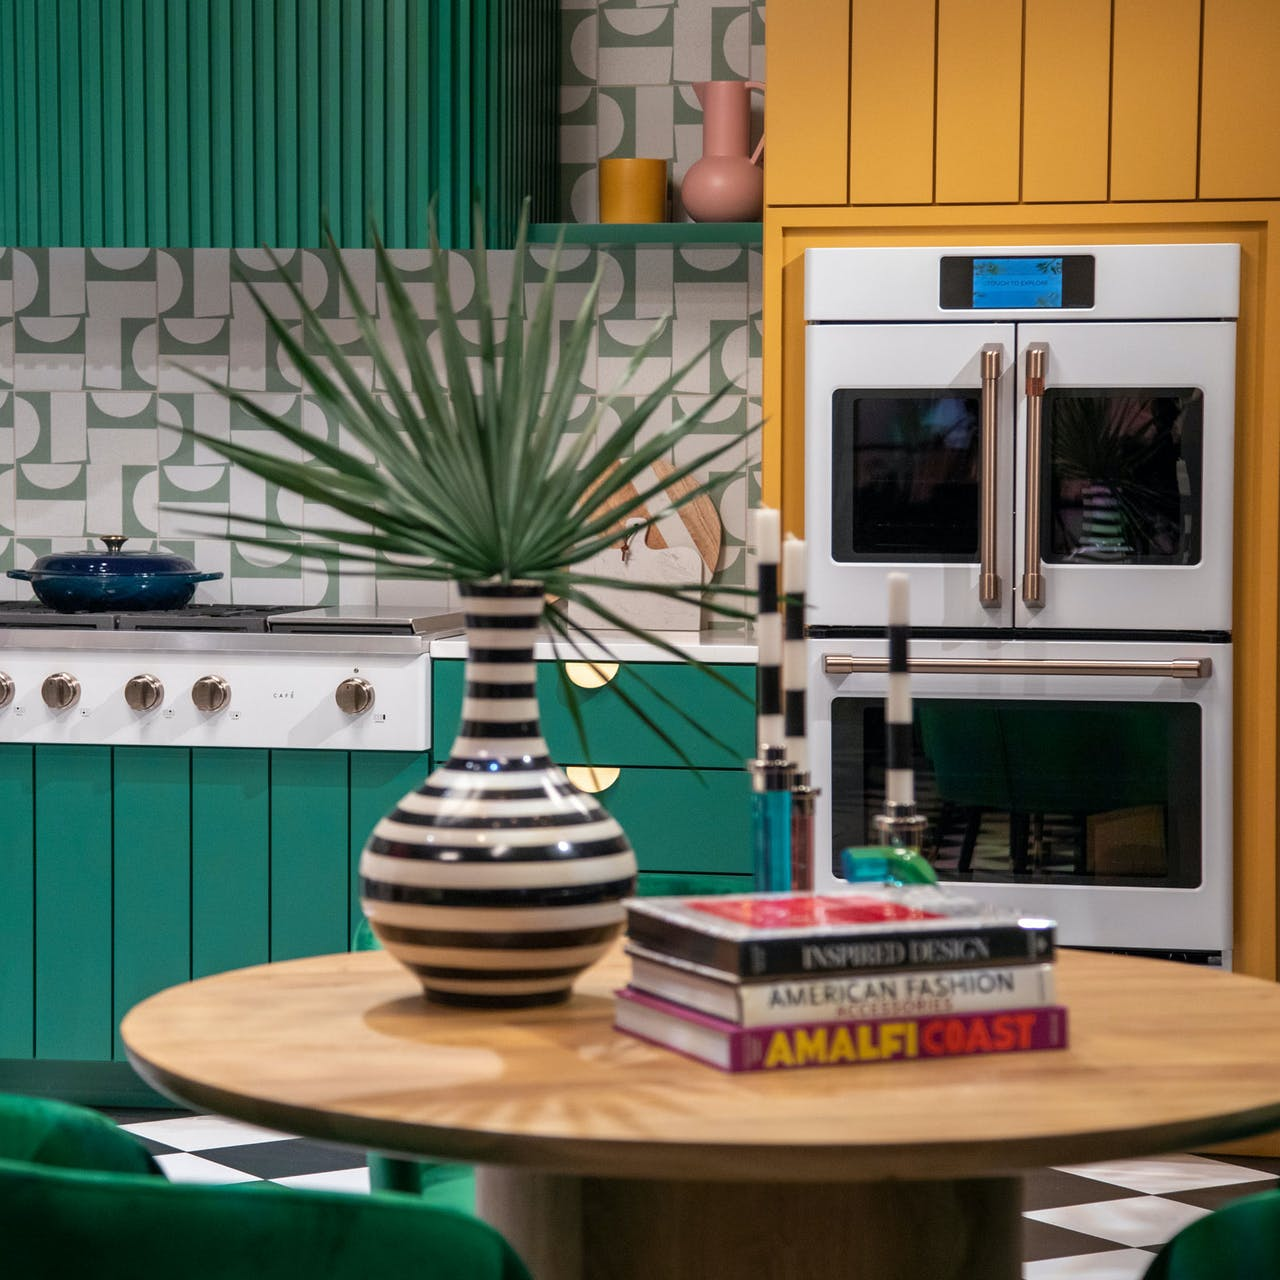 Matte white appliances in colorful kitchen